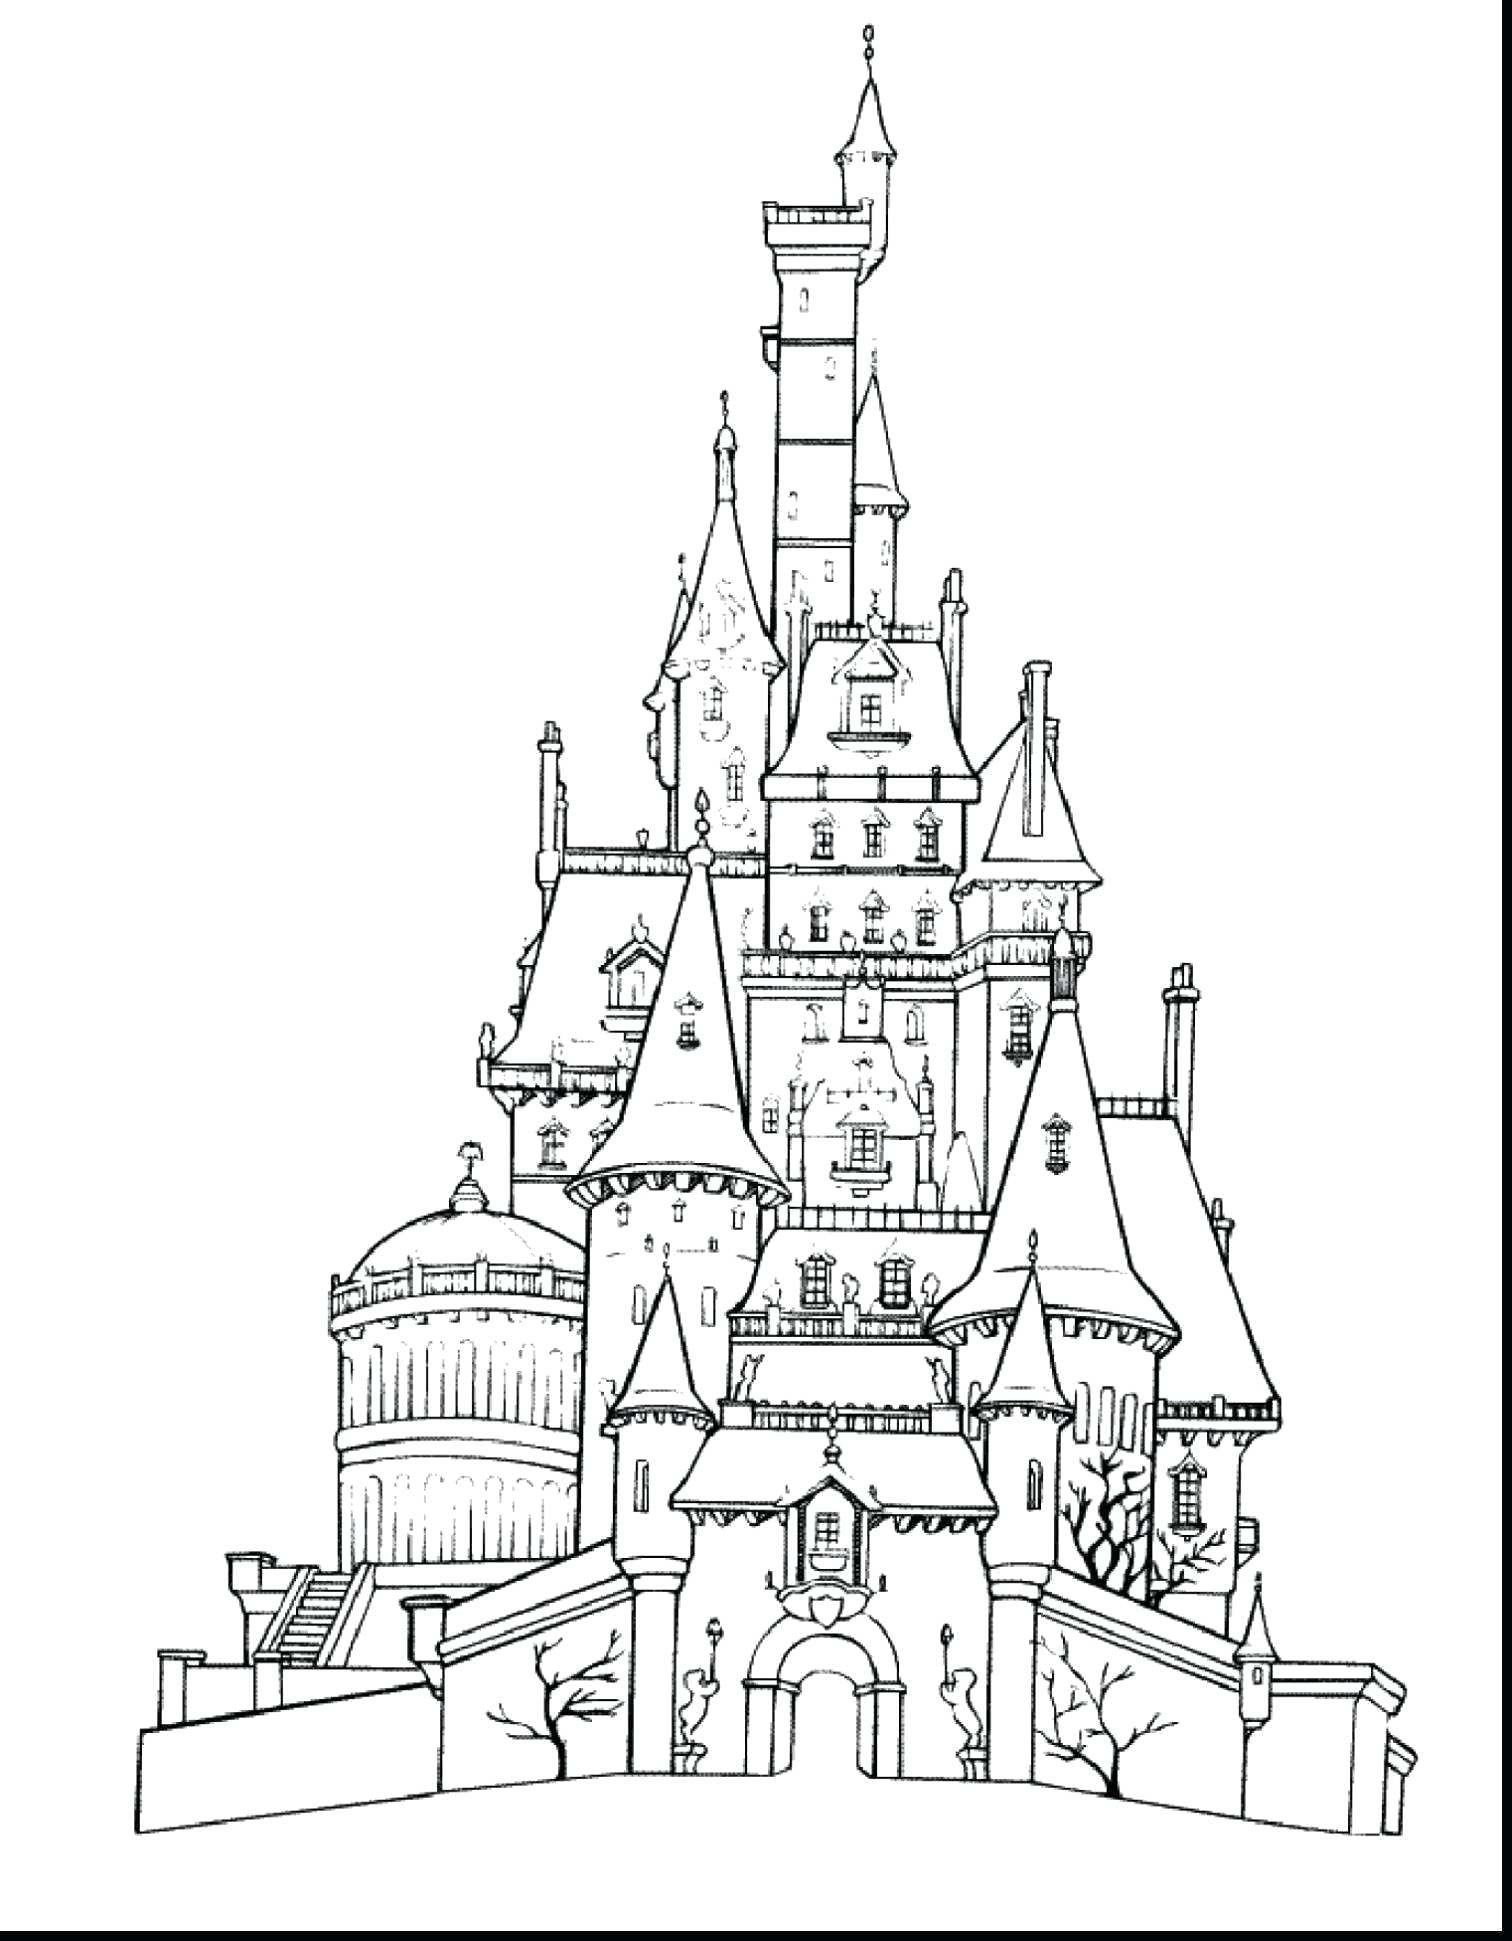 Disney Princess Castle Coloring Pages Coloring Pages Coloringastle Pages Fresh Best World Castle Coloring Page Disney Coloring Pages Free Disney Coloring Pages